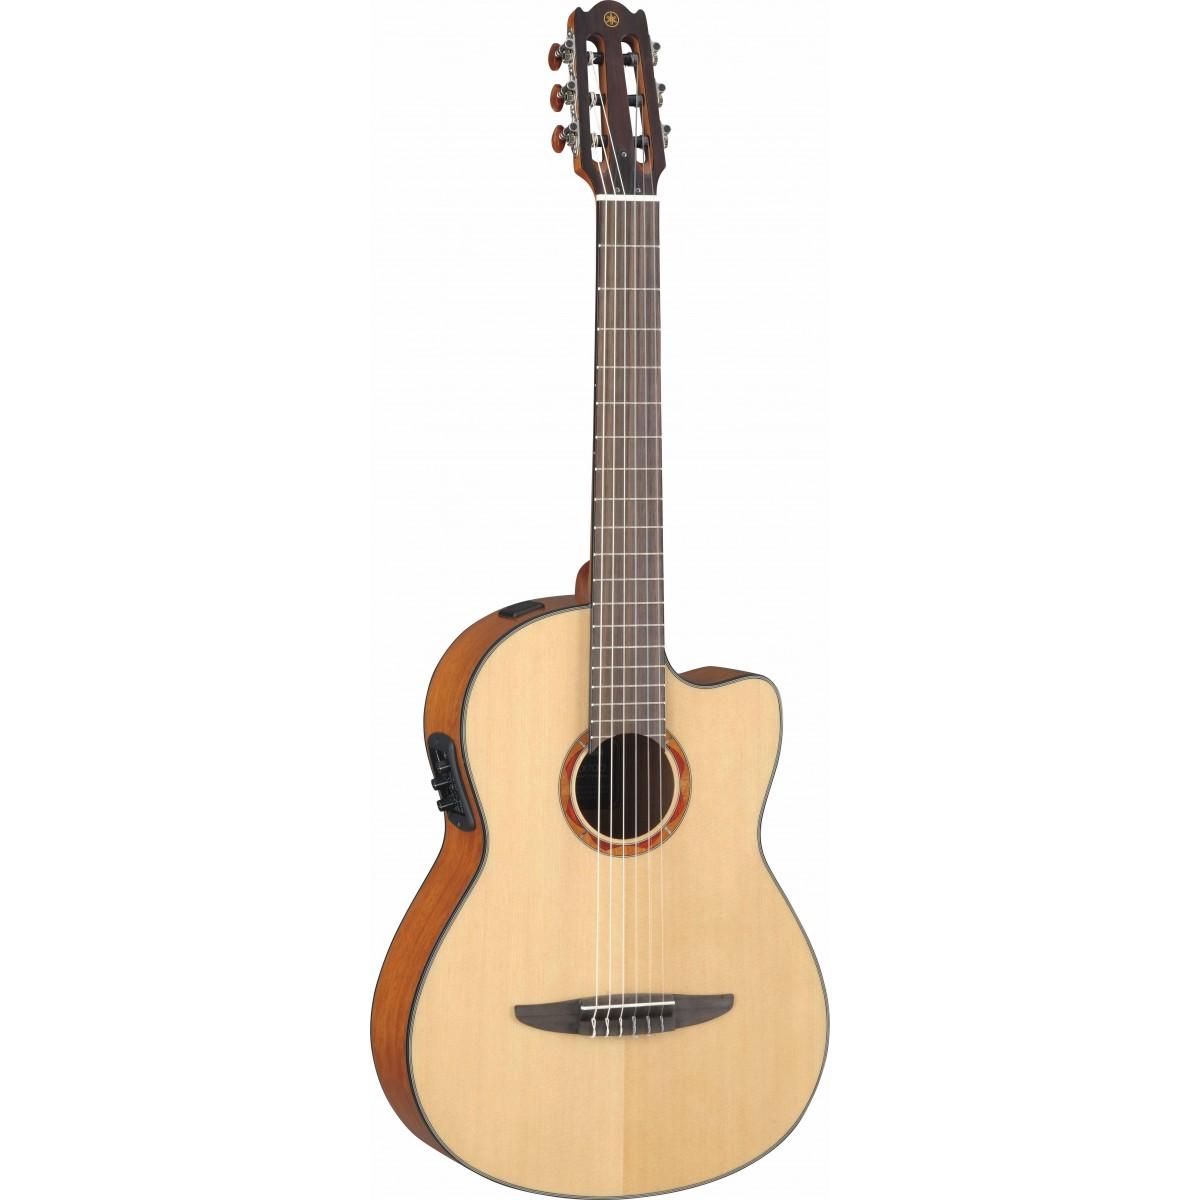 yamaha ncx700 classical cutaway guitar w pickup. Black Bedroom Furniture Sets. Home Design Ideas